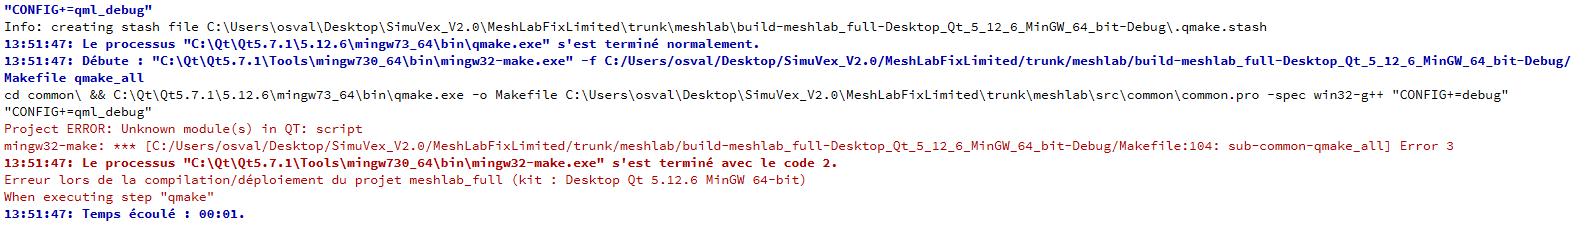 error_meshlab_fullpro.PNG